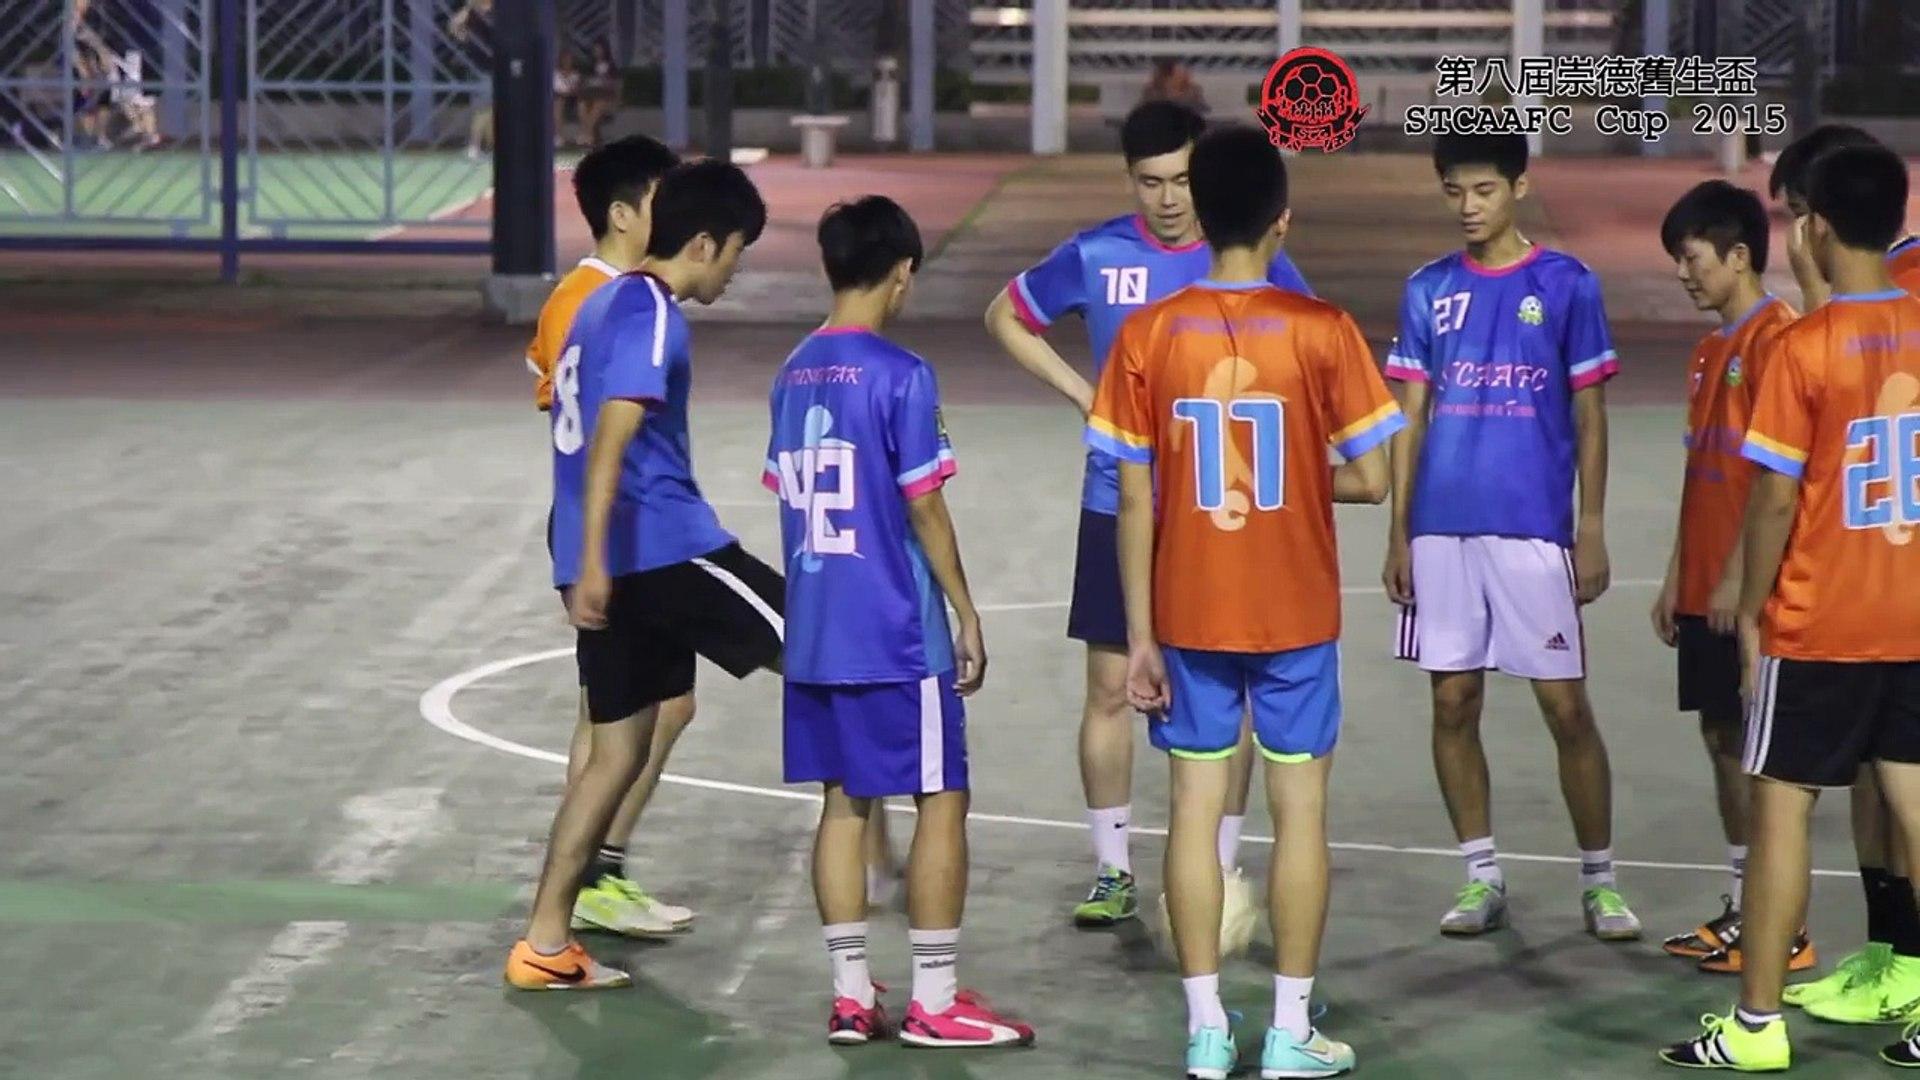 FC三菱 Vs 五十三門徒 (祟德舊生盃2015 第三個比賽日 25/08/2015)